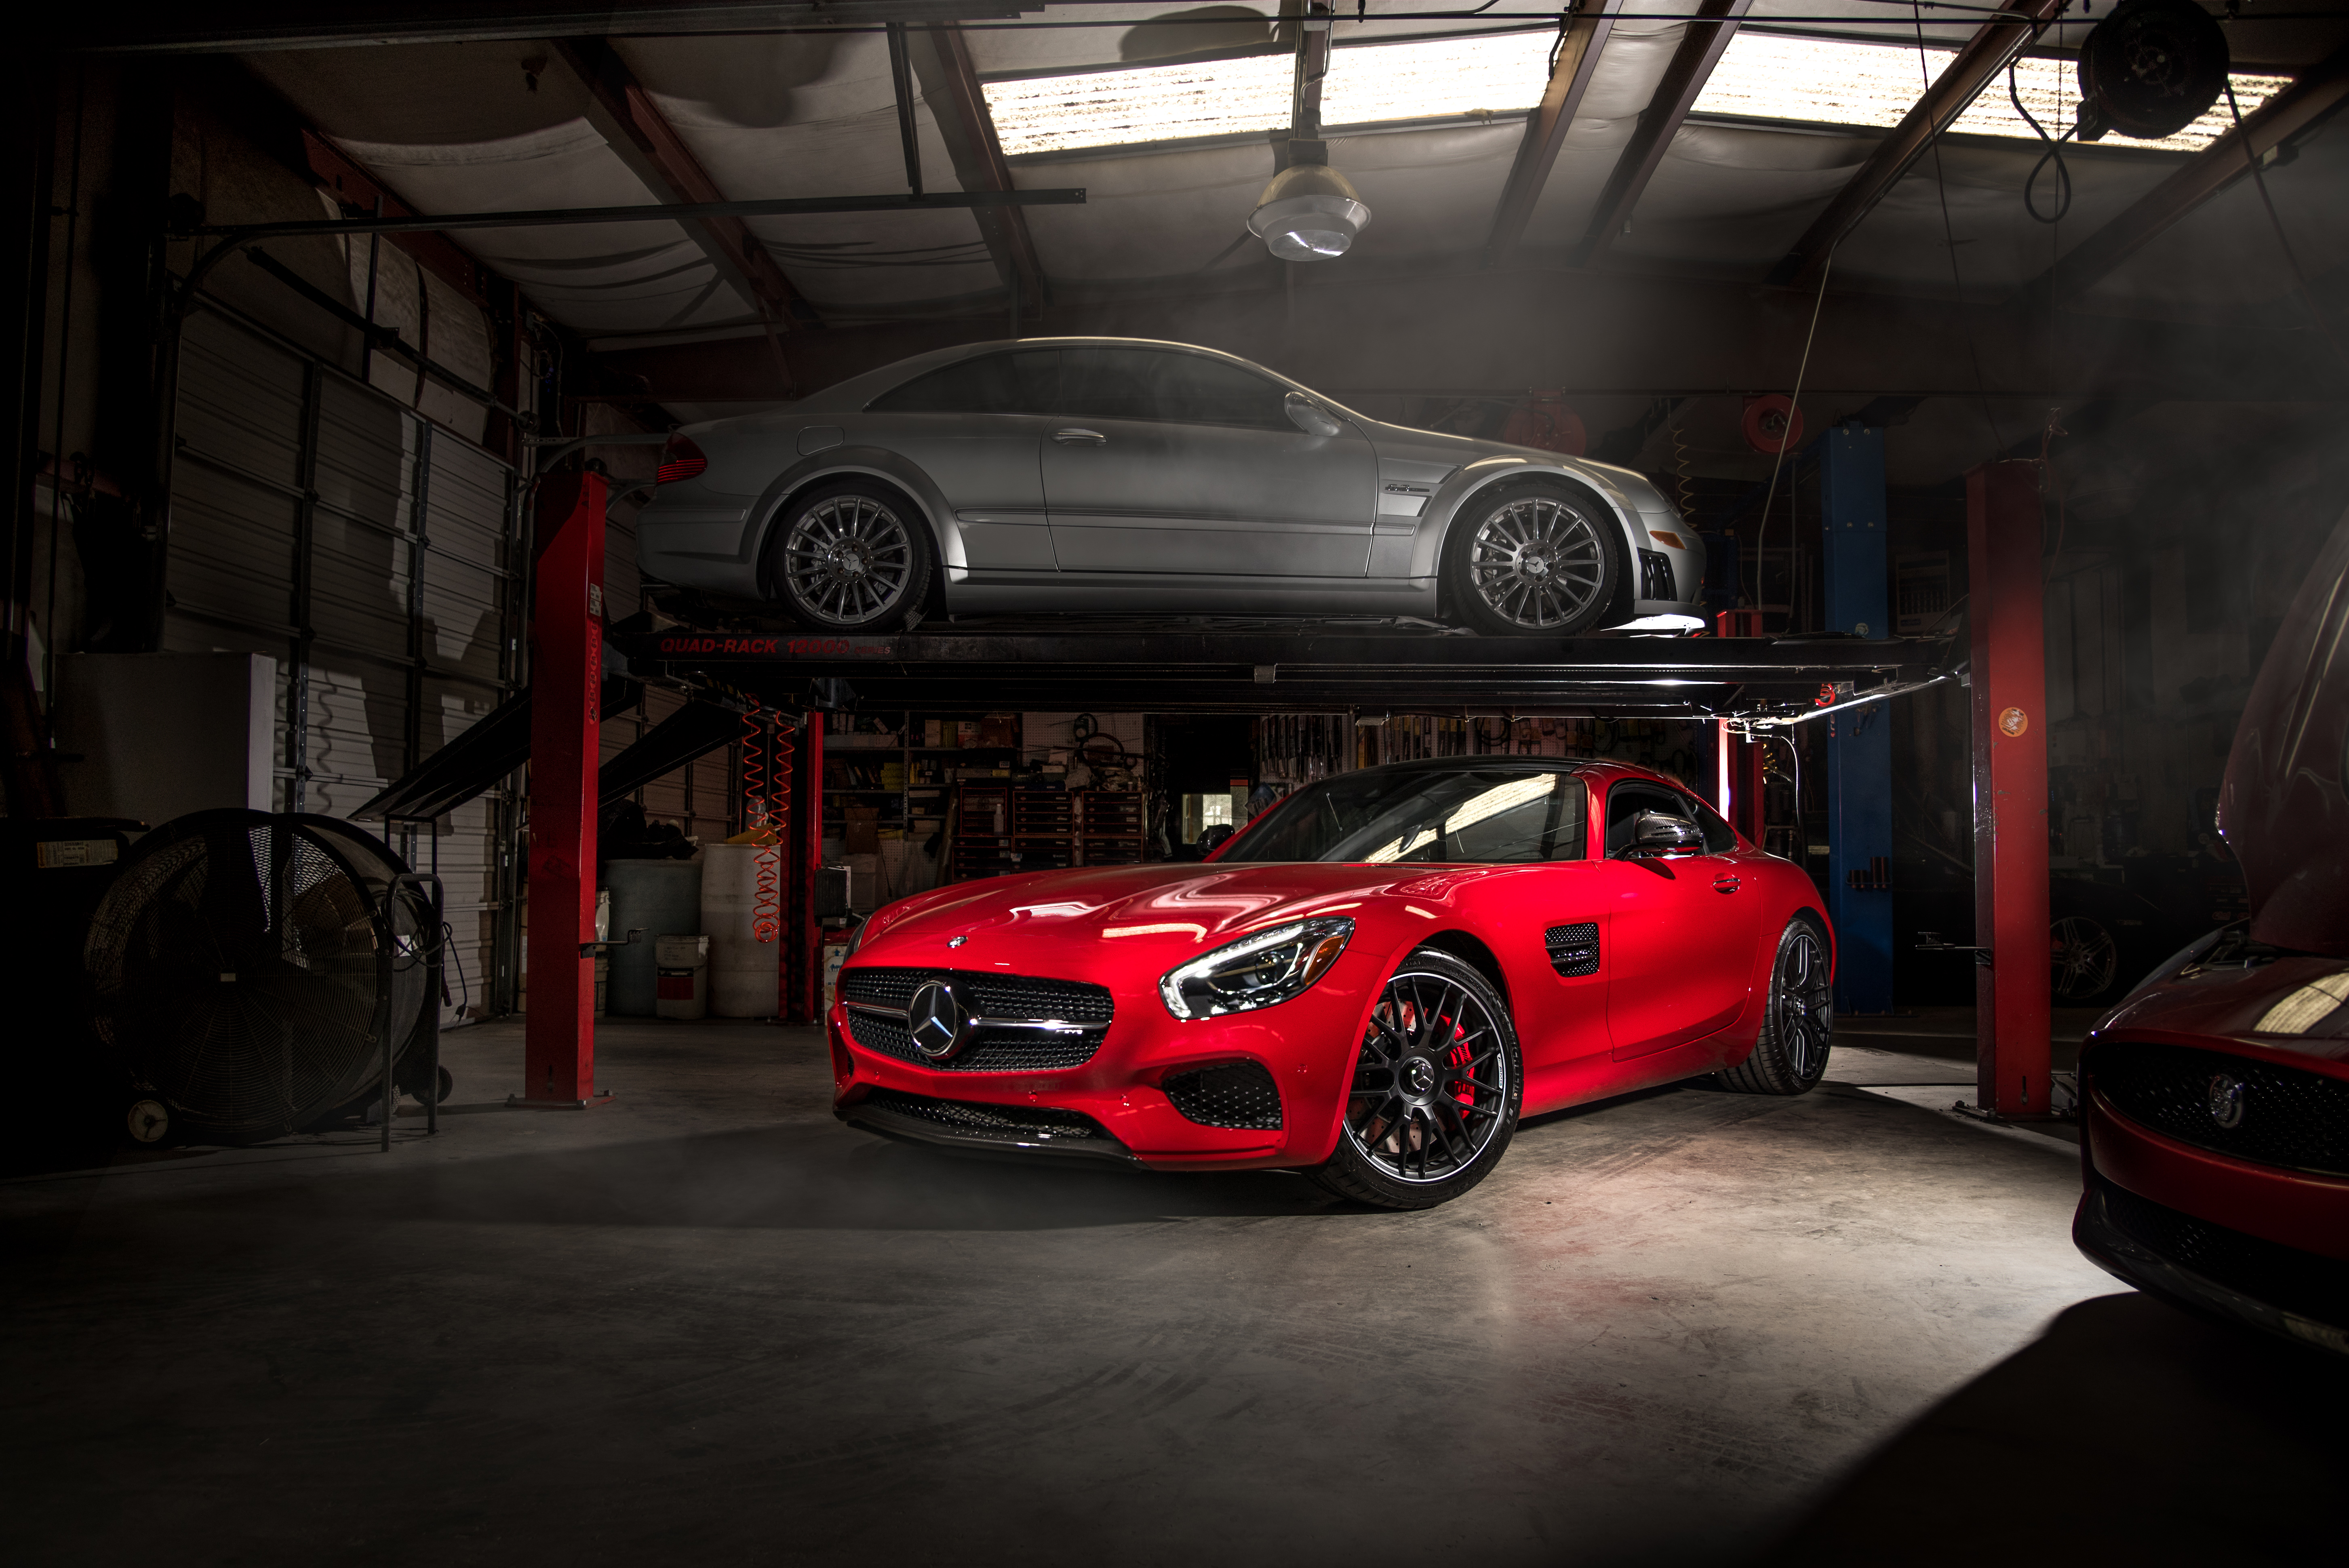 Mercedes Benz GT-S